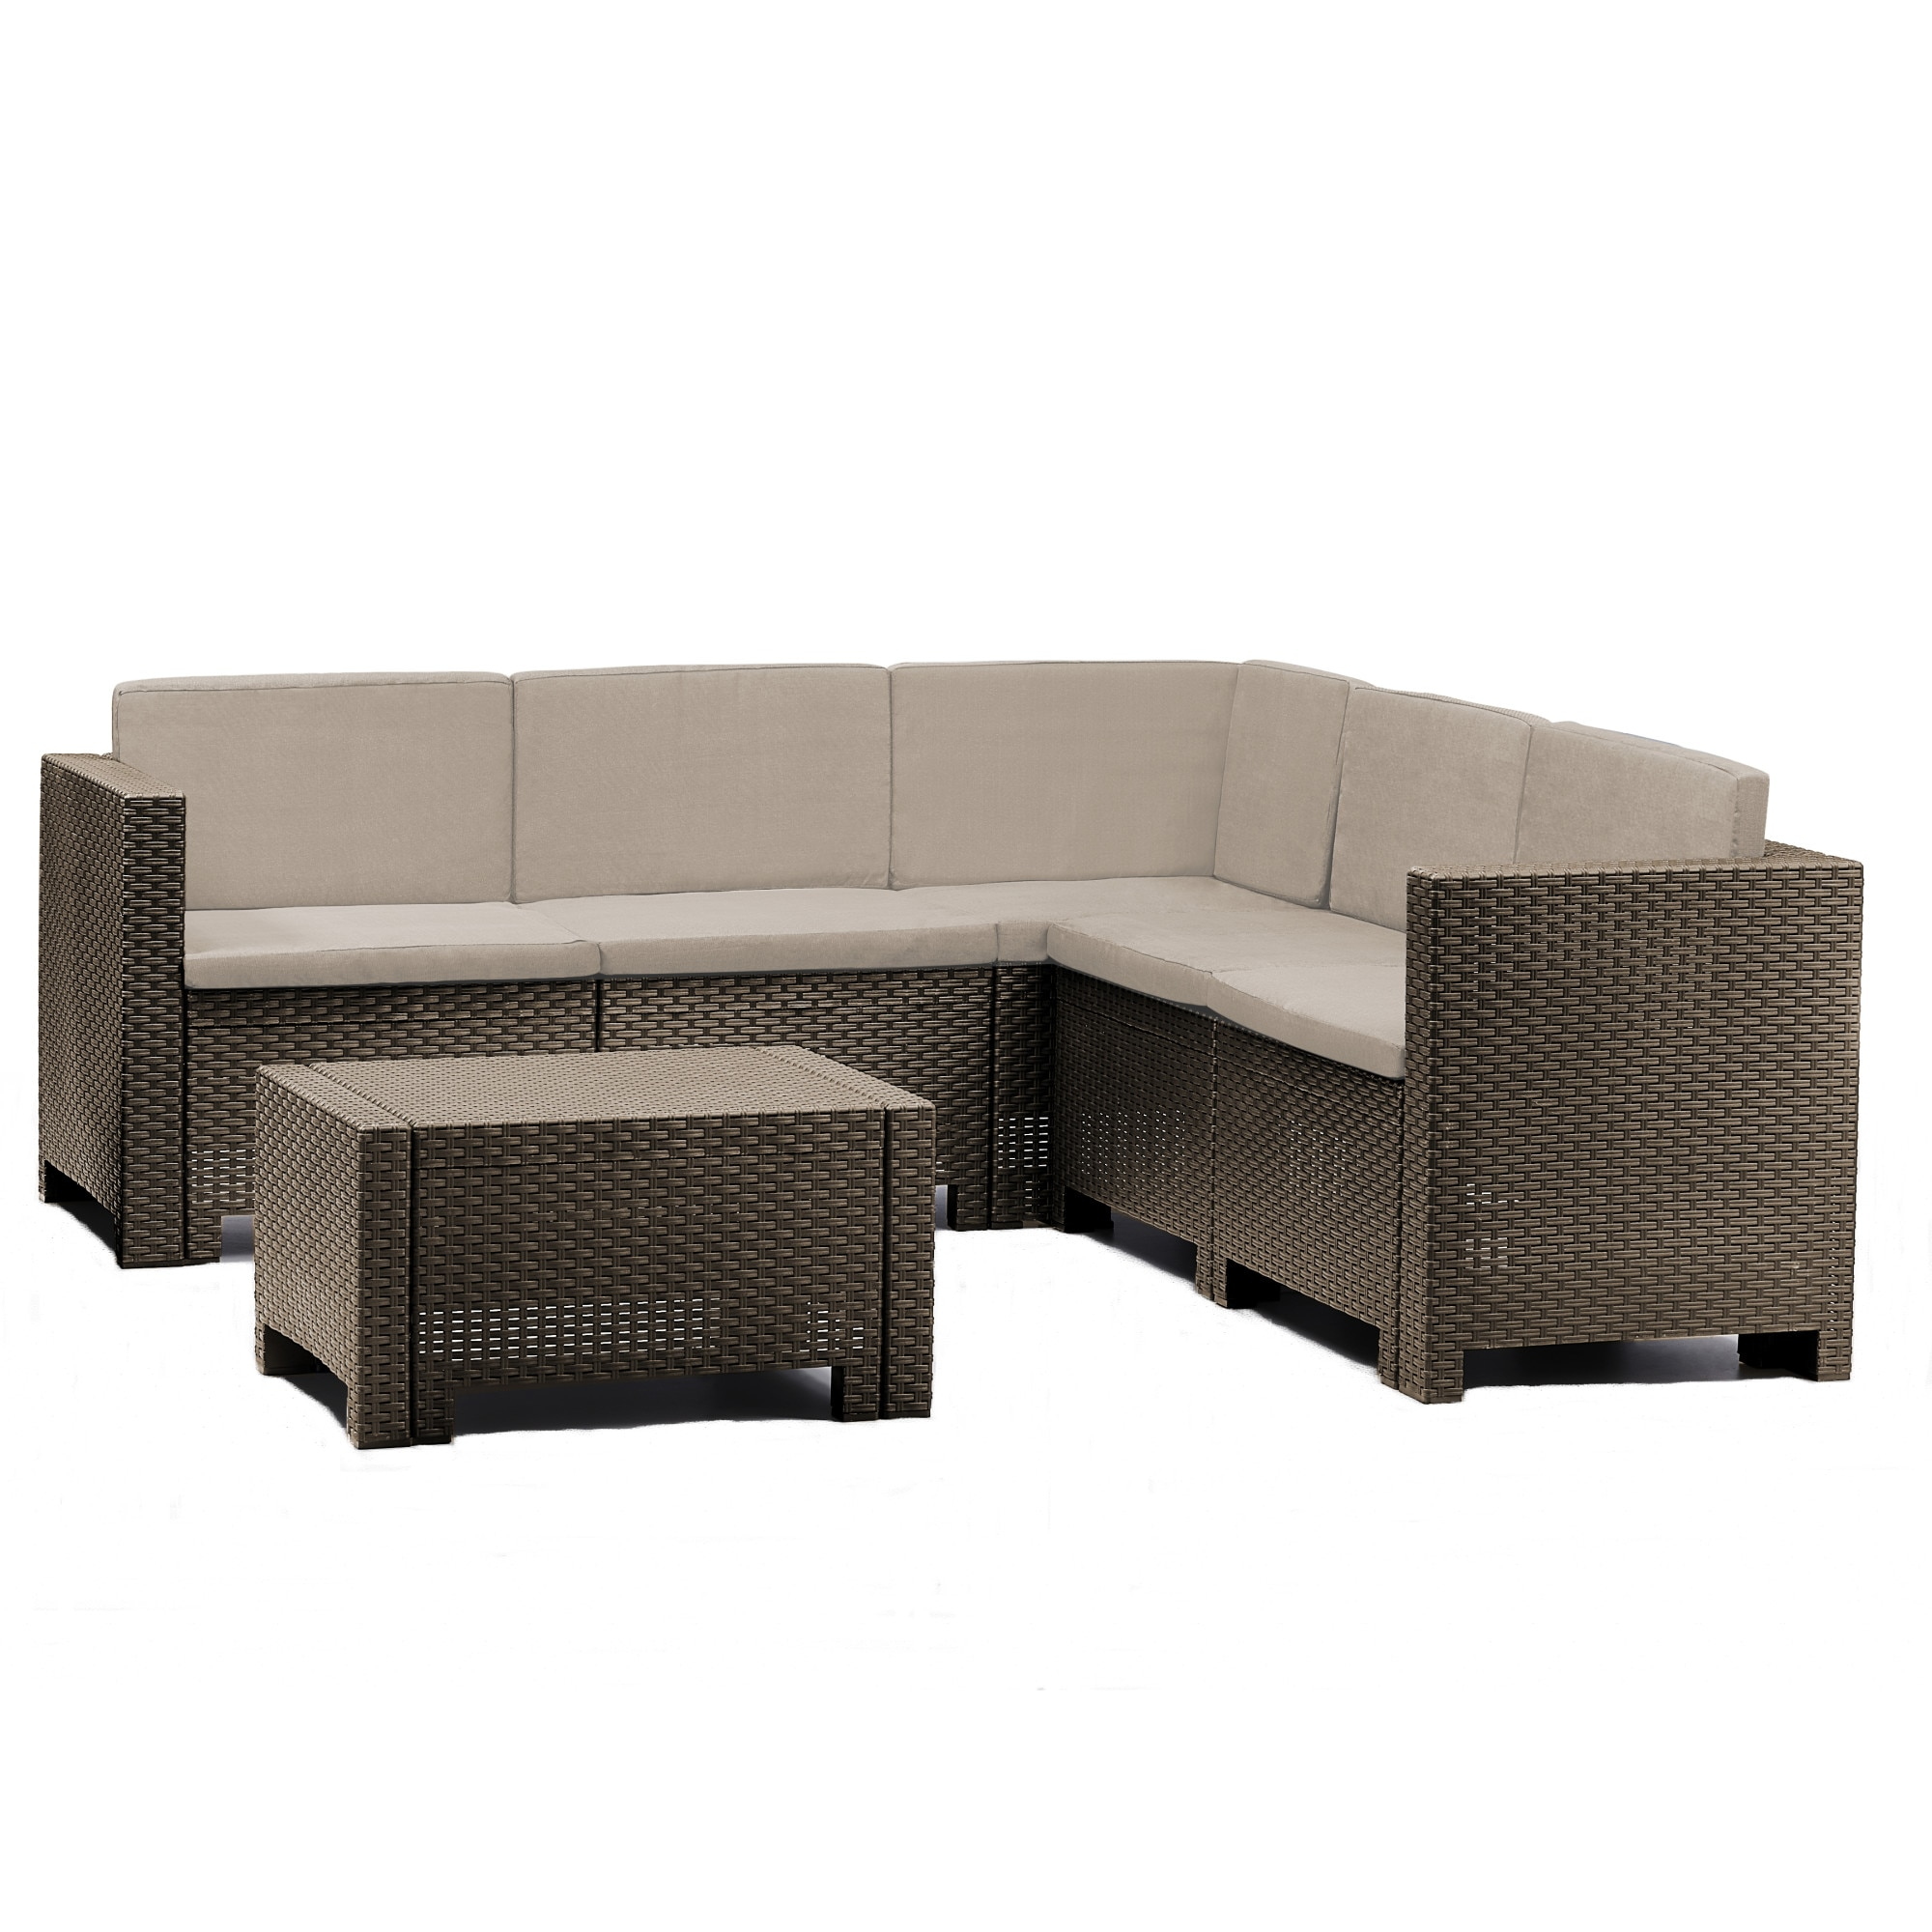 Fotografie Set mobilier gradina/terasa Colorado, coltar 5 locuri + masuta, perne incluse, maro